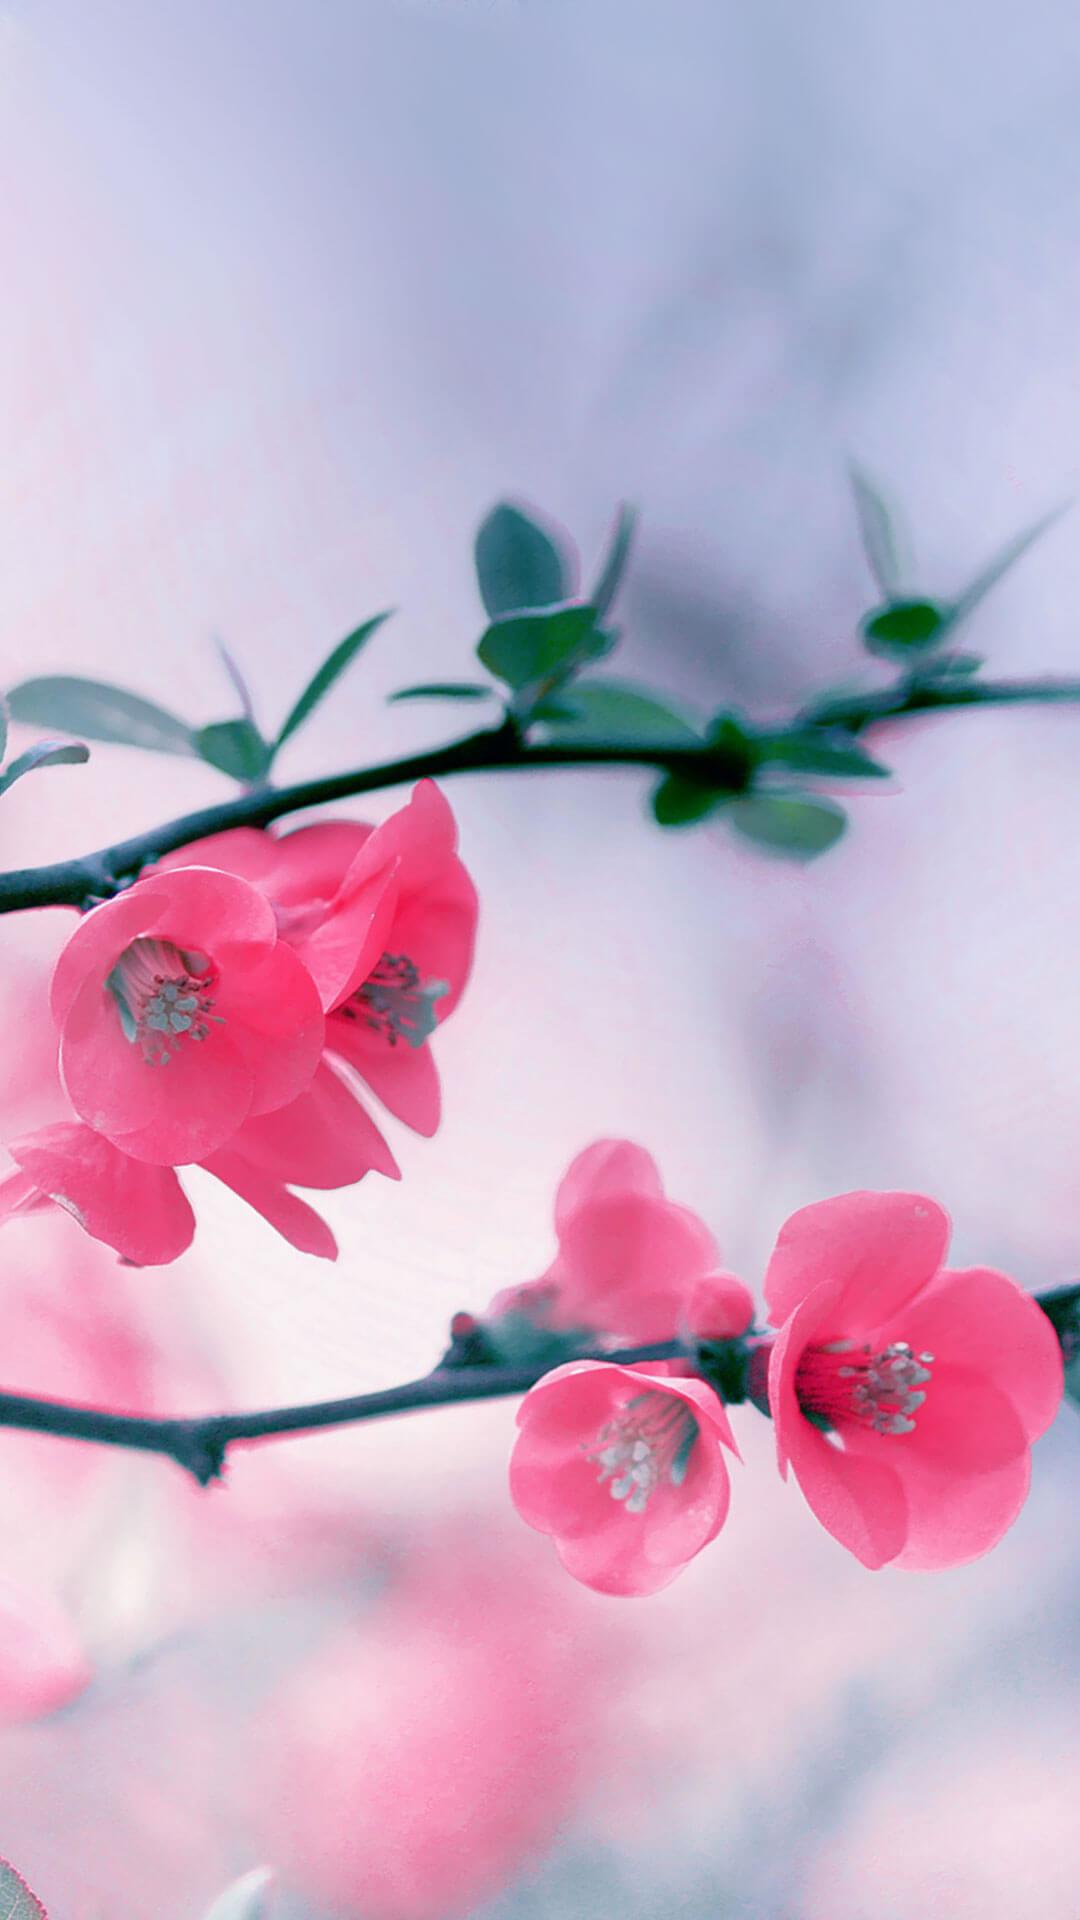 Cherry Blossom Flowers iPhone 6 Wallpaper HD